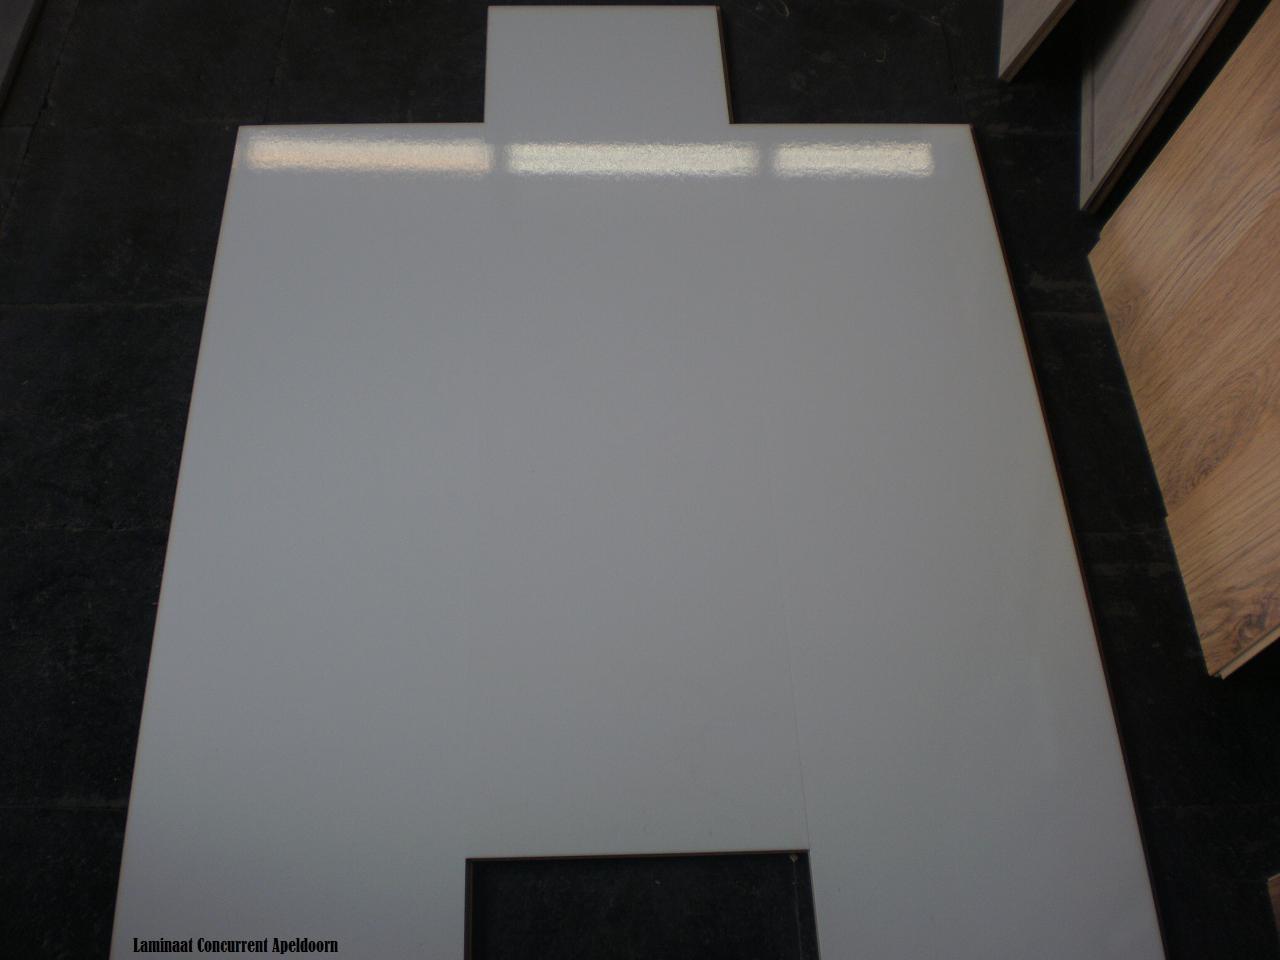 Hoogglans wit d xl zonder naad wit tegel laminaat